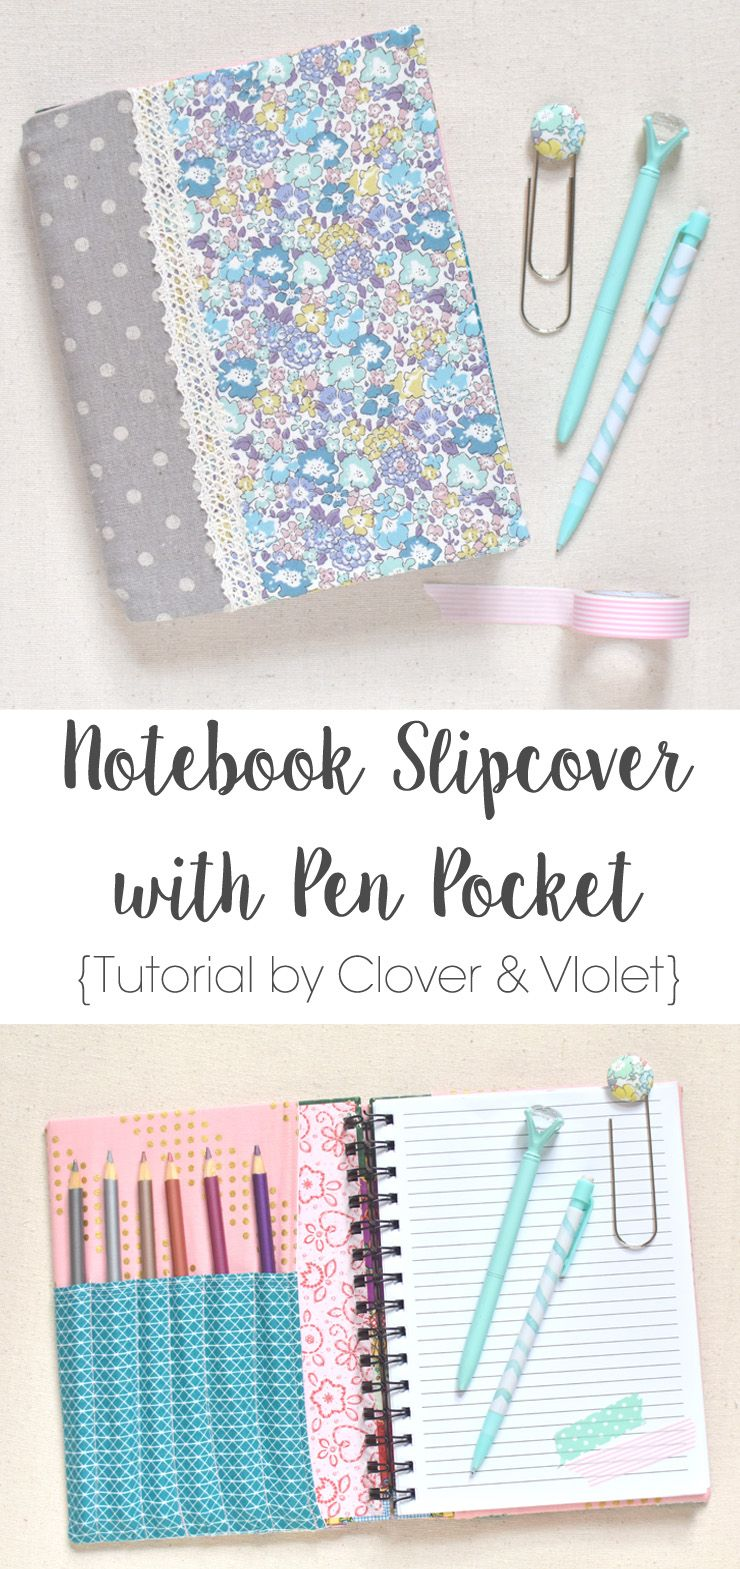 Notebook Slipcover with Pen Pocket {Tutorial} | Filofax, Nähideen ...